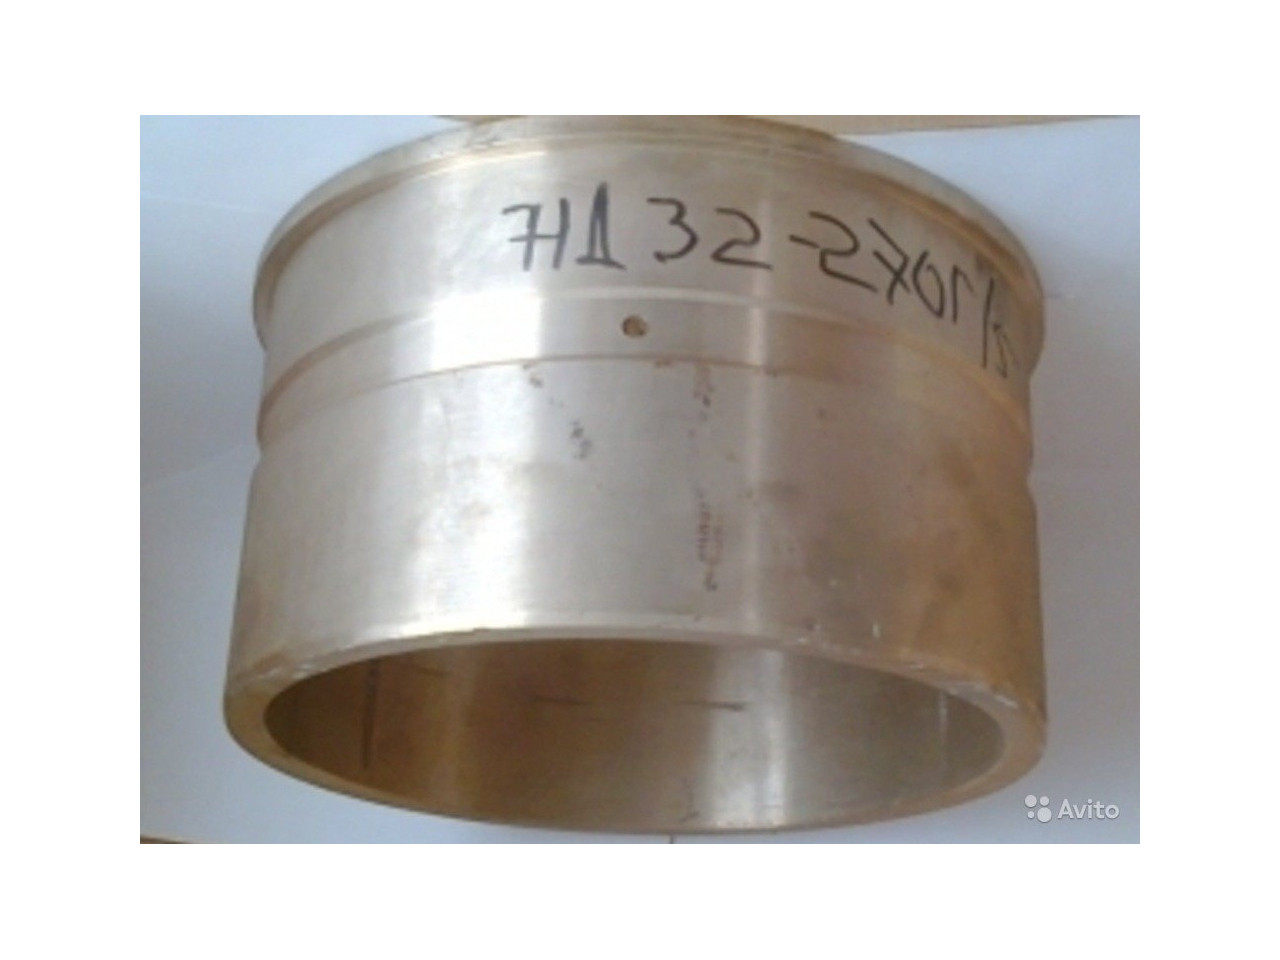 Бронзовая втулка нд 32-270Г/5 на экг-5, эо 2503